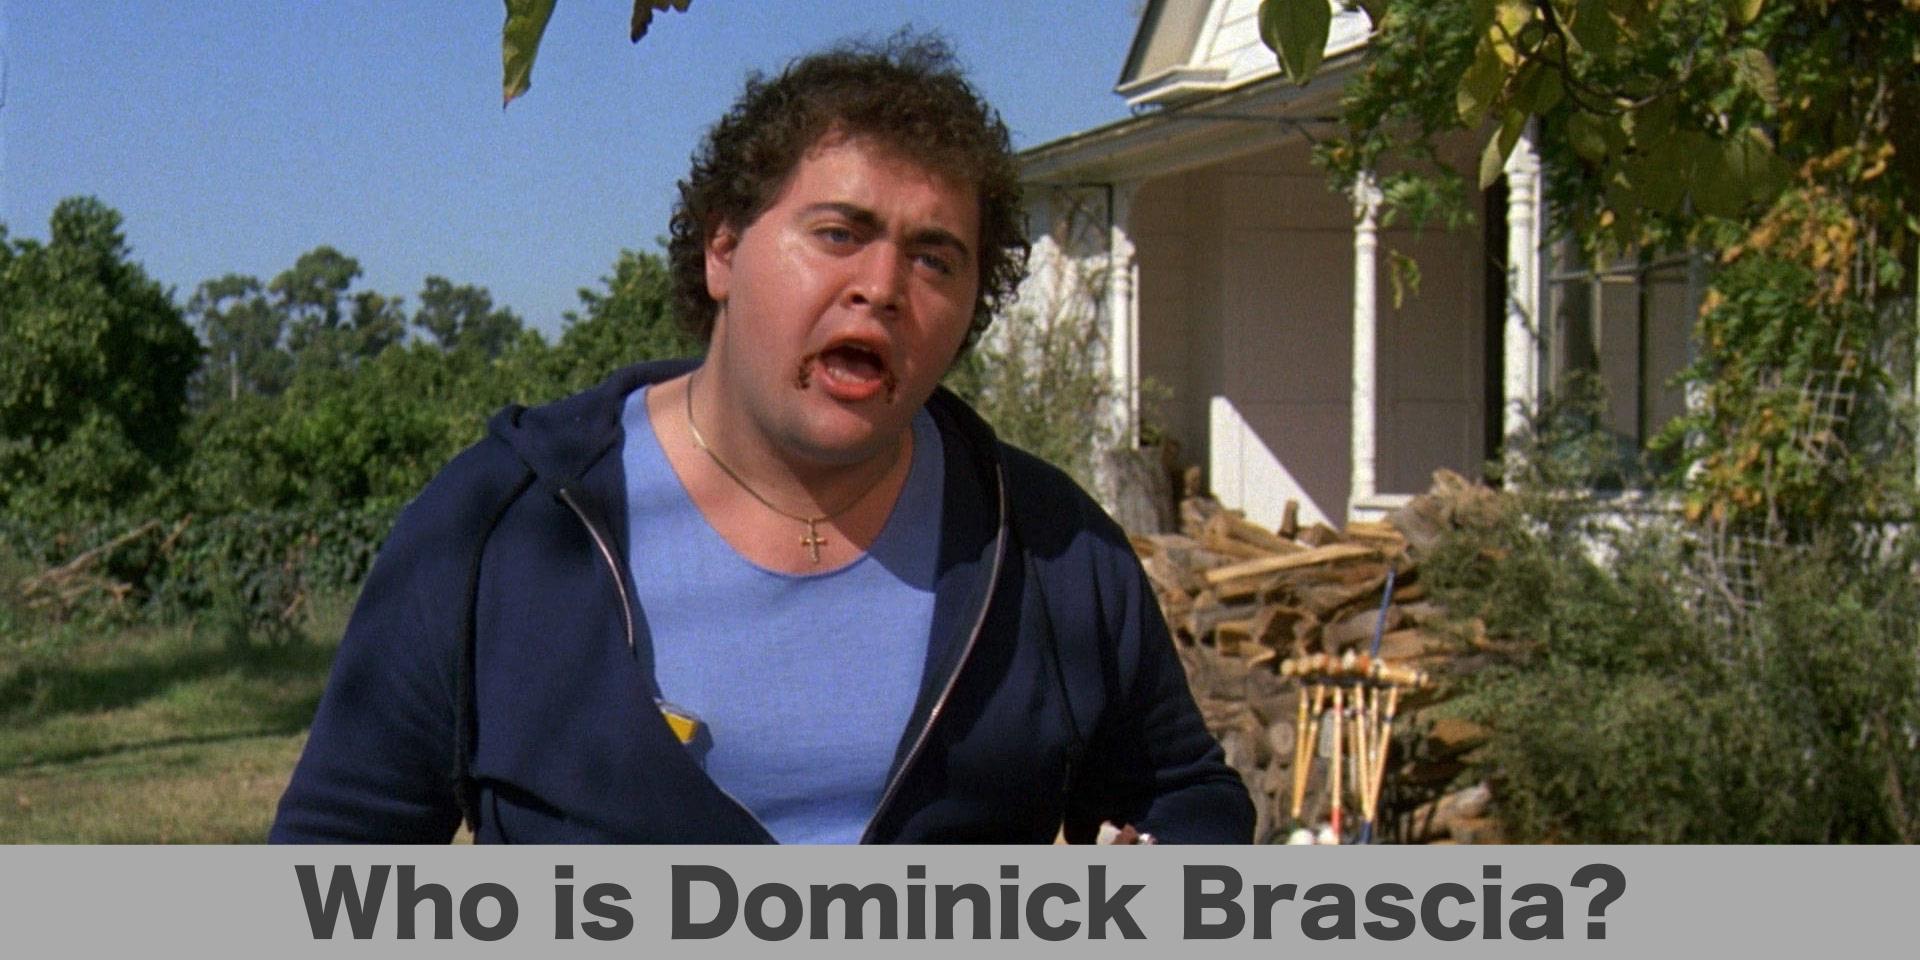 What Happened Dominick Brascia? Charlie Sheen Whistleblower!